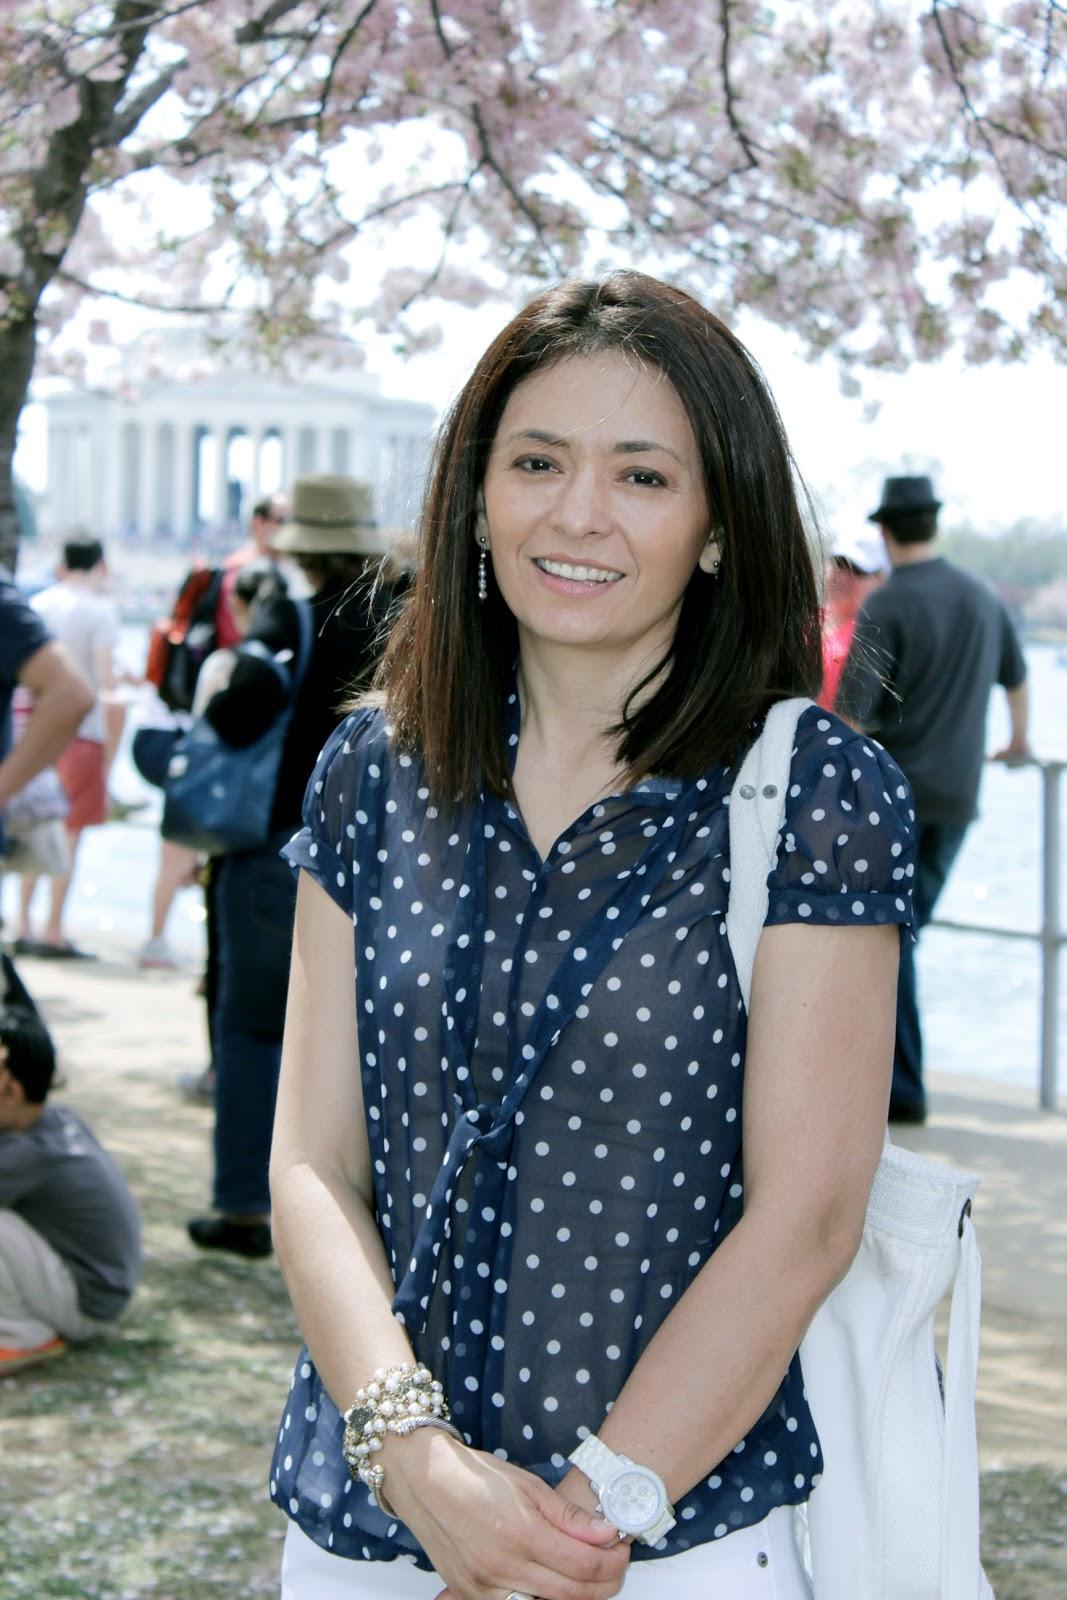 Cristina Garay at Cherry blossom festival Washington DC